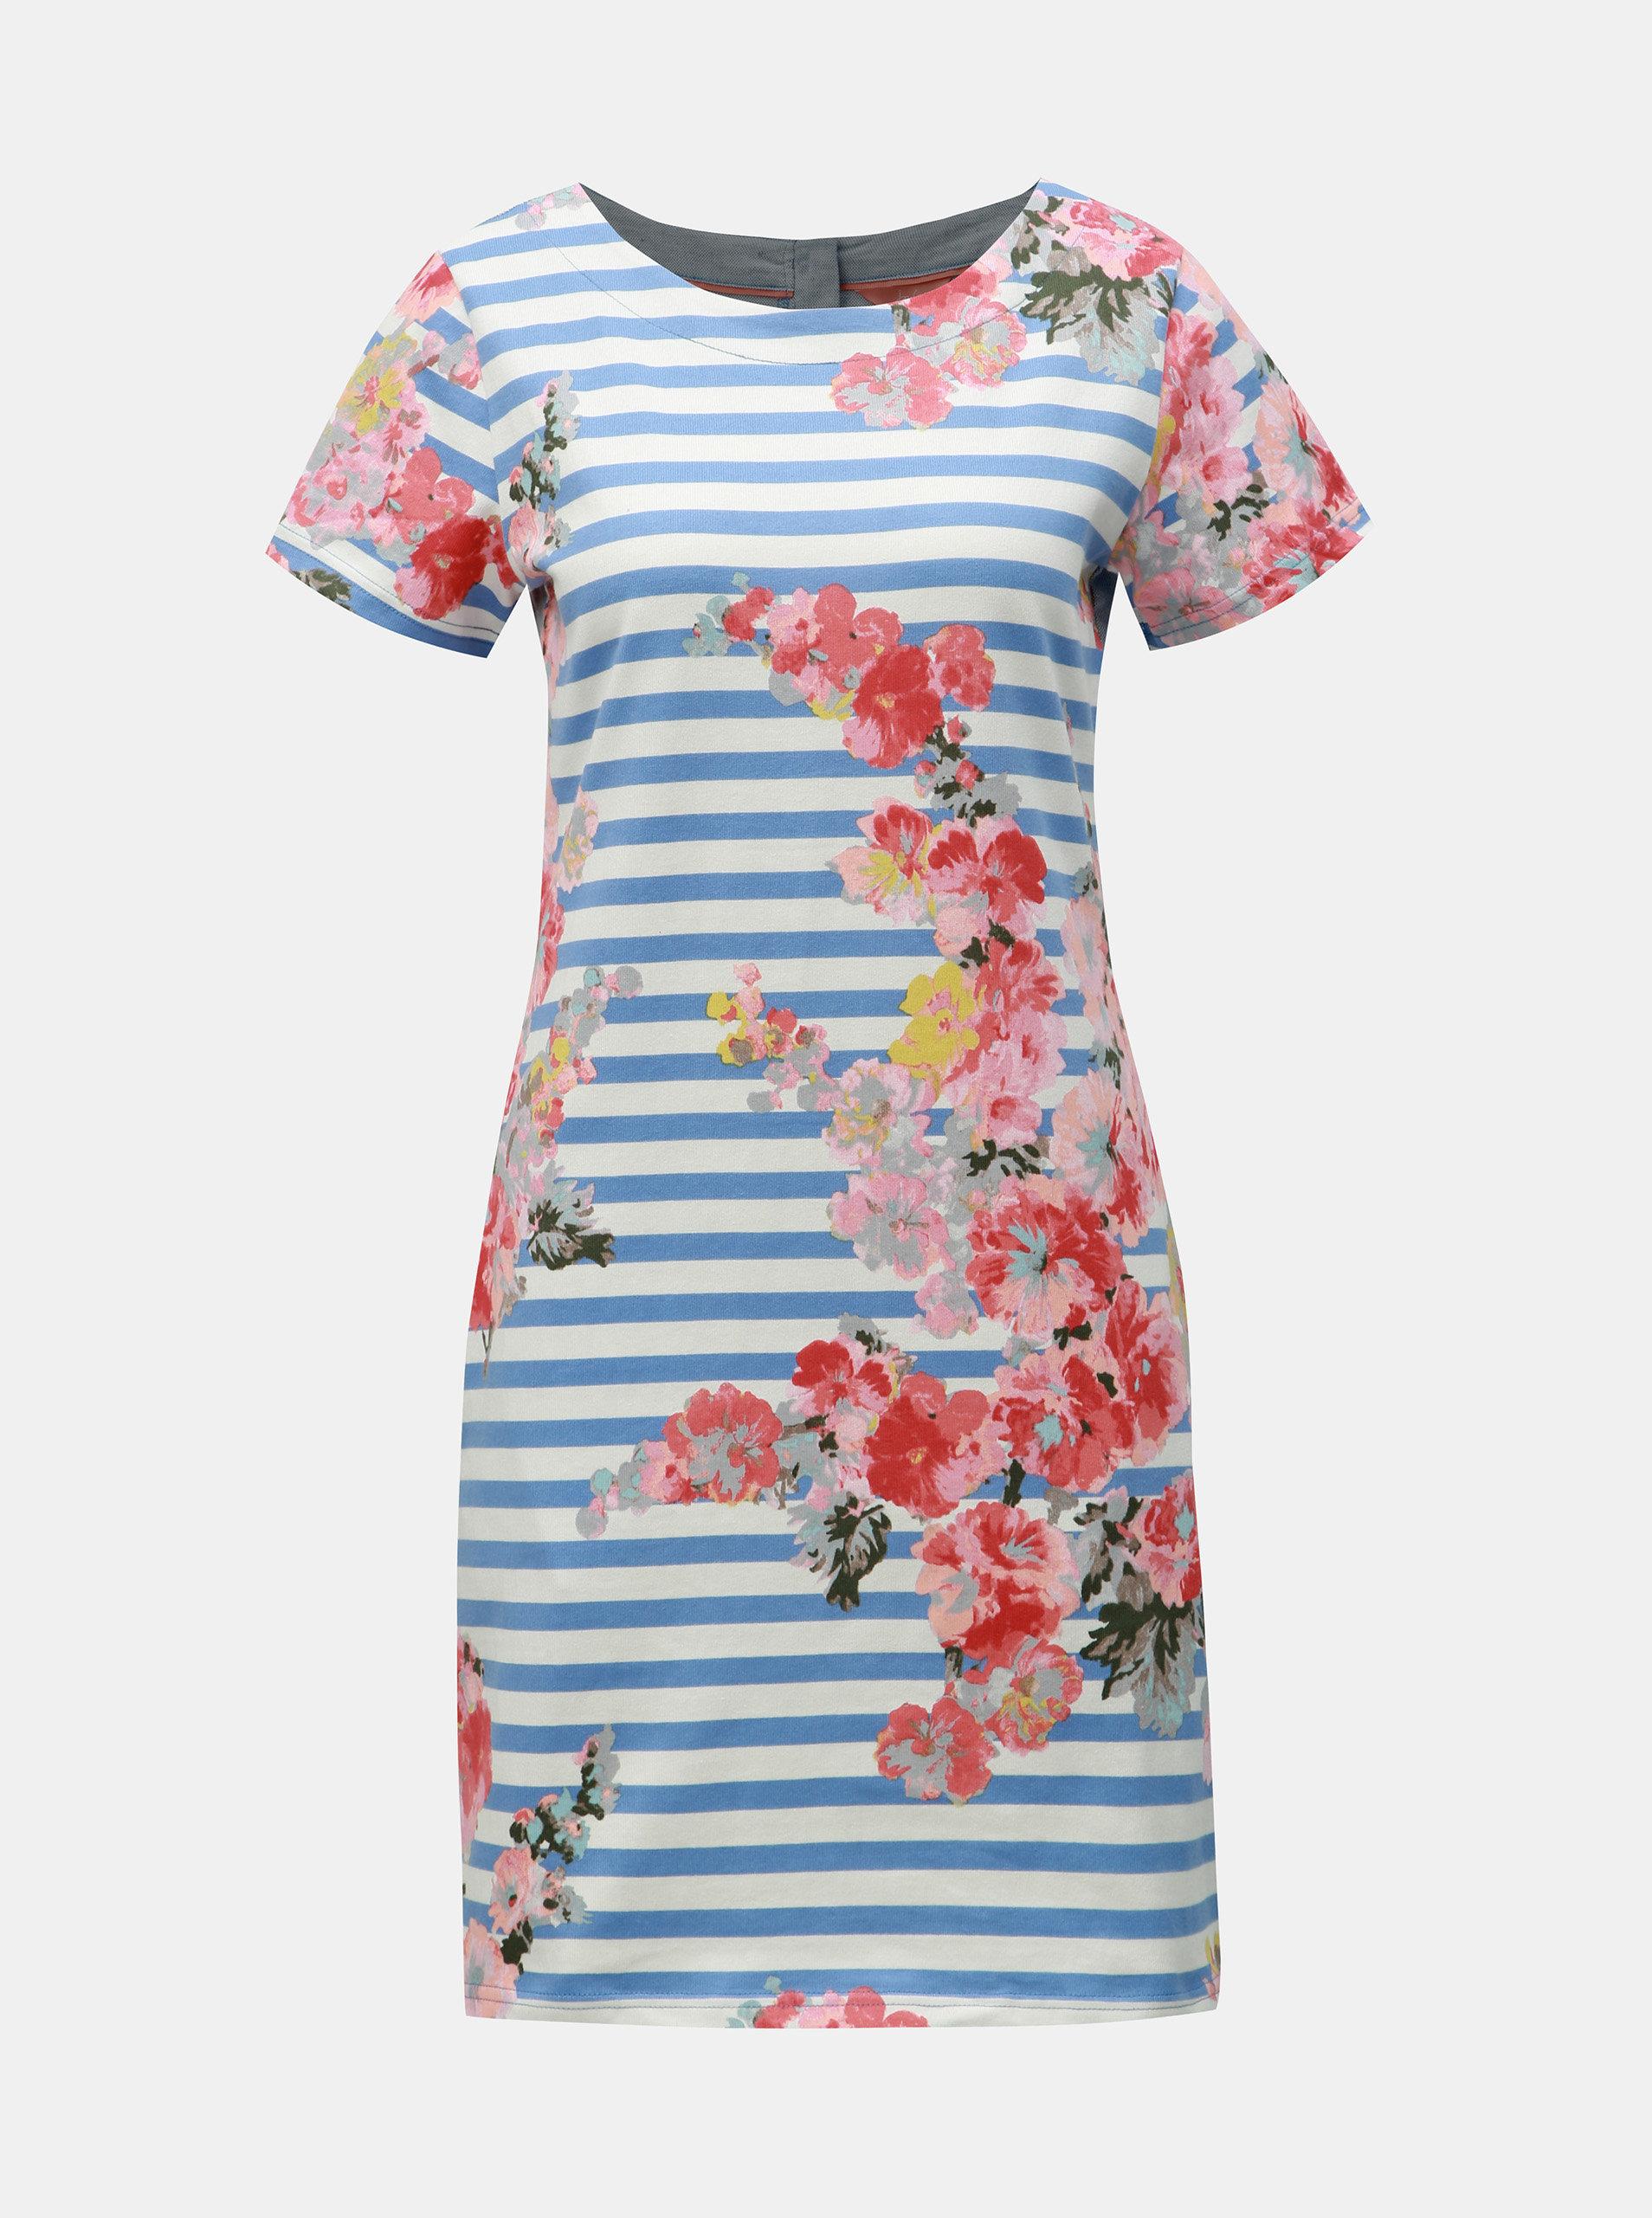 9a9d1c3ef62d Bielo–modré kvetované šaty s prímesou ľanu Tom Joule Ottie ...